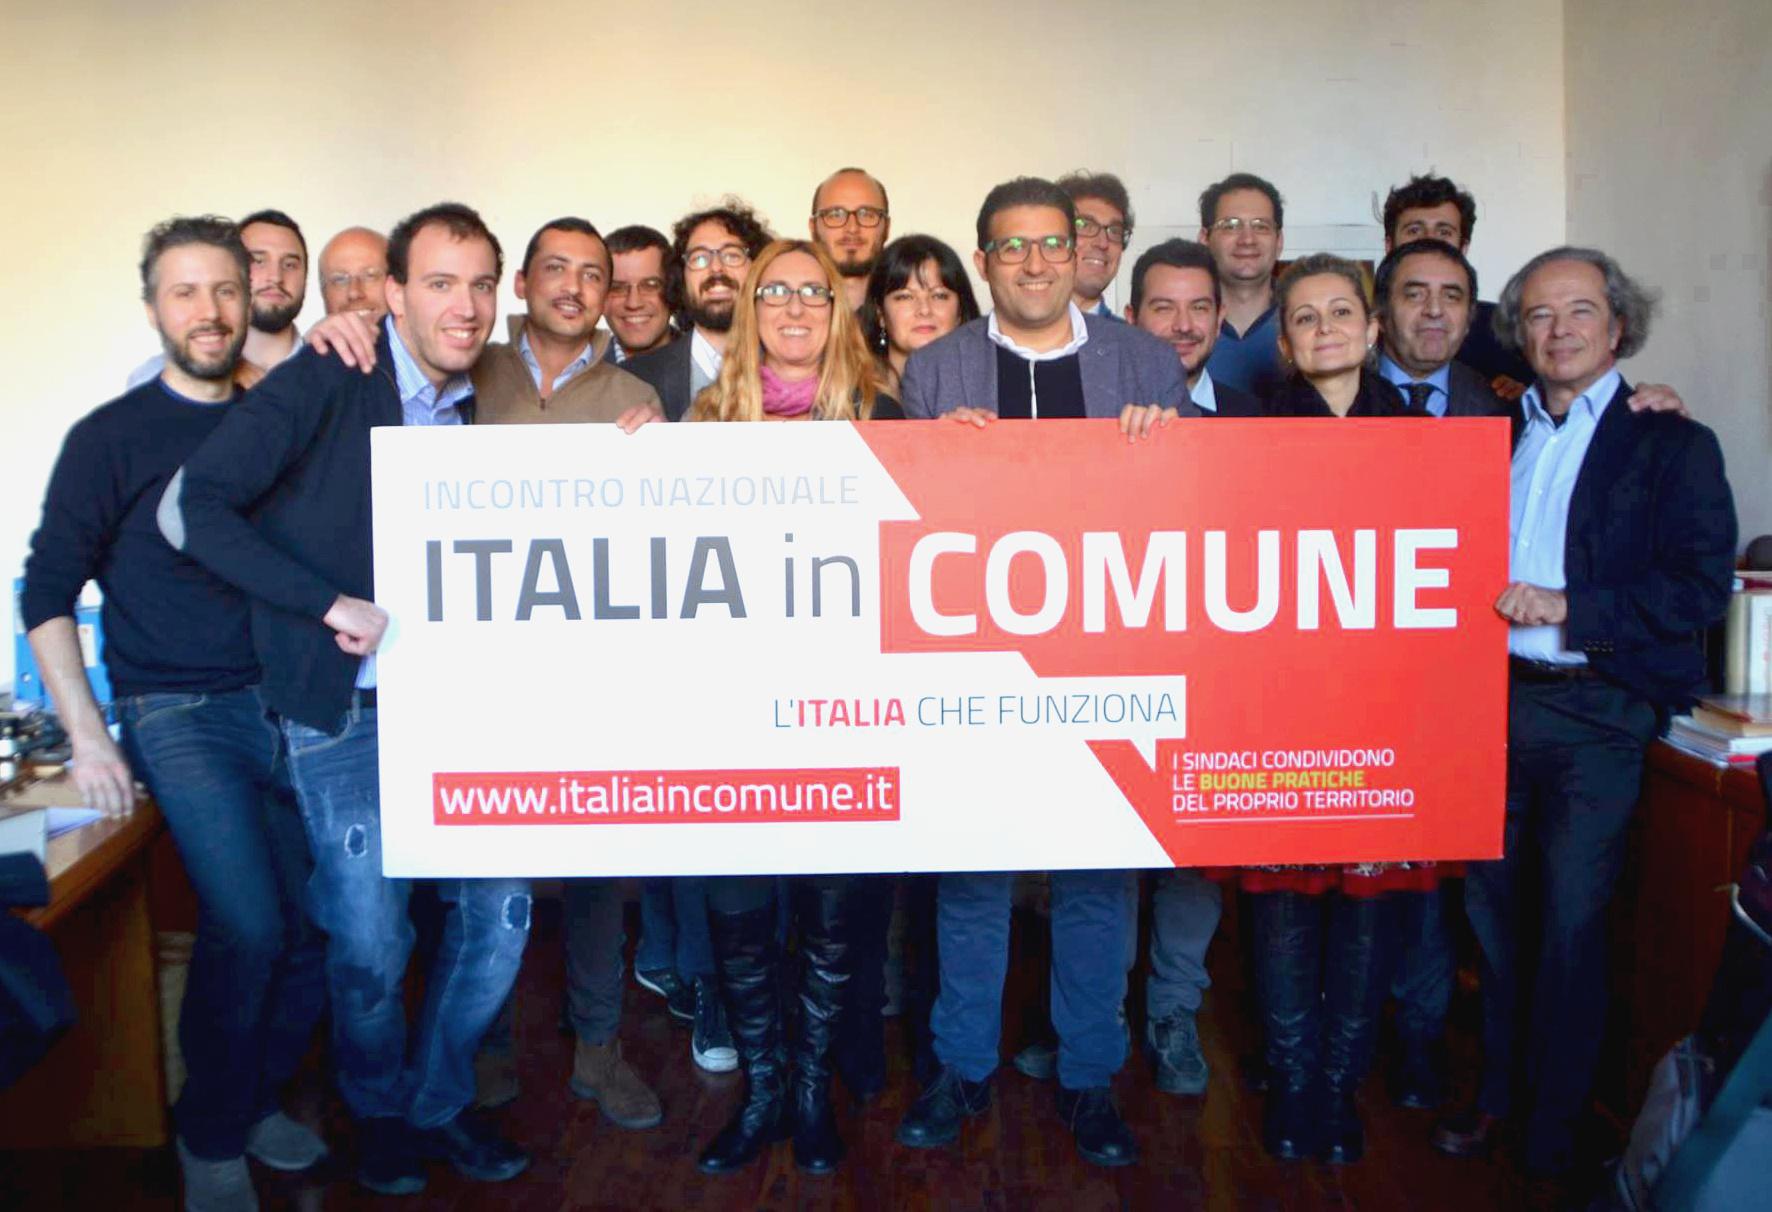 italia in comune